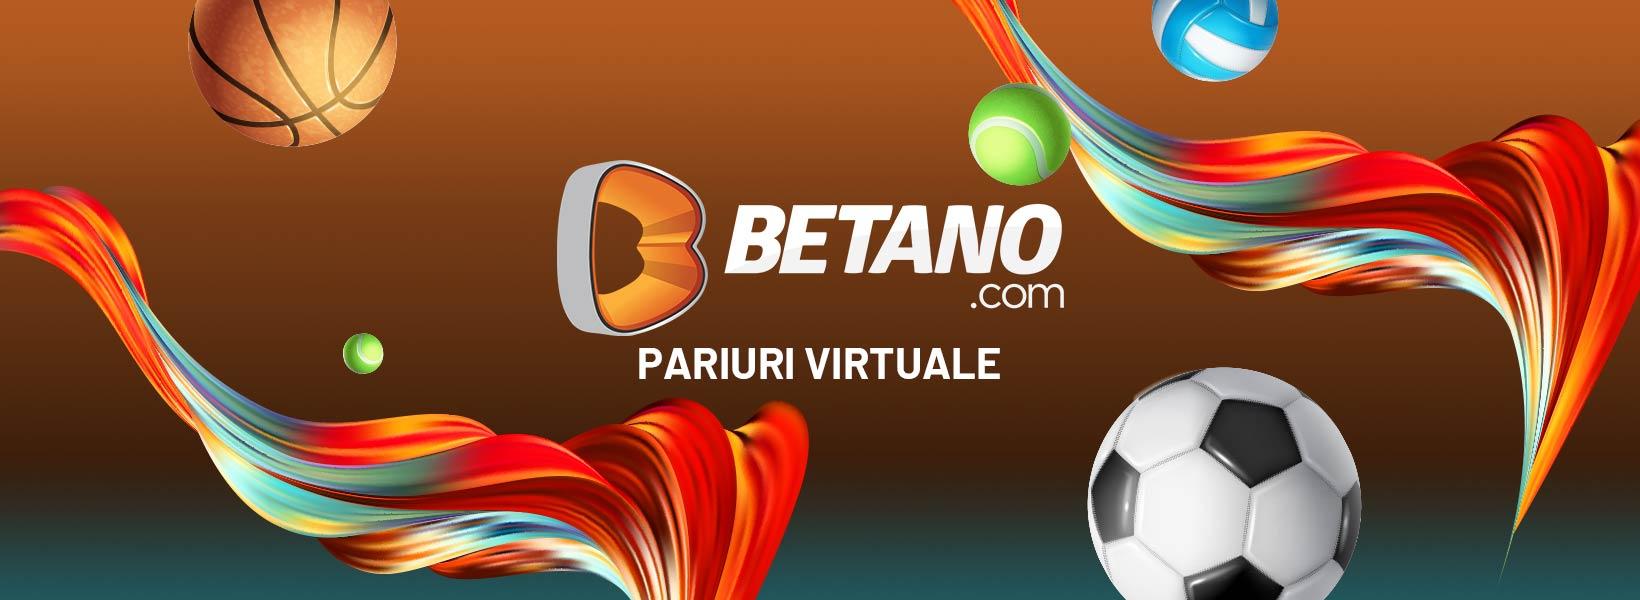 betano virtuale